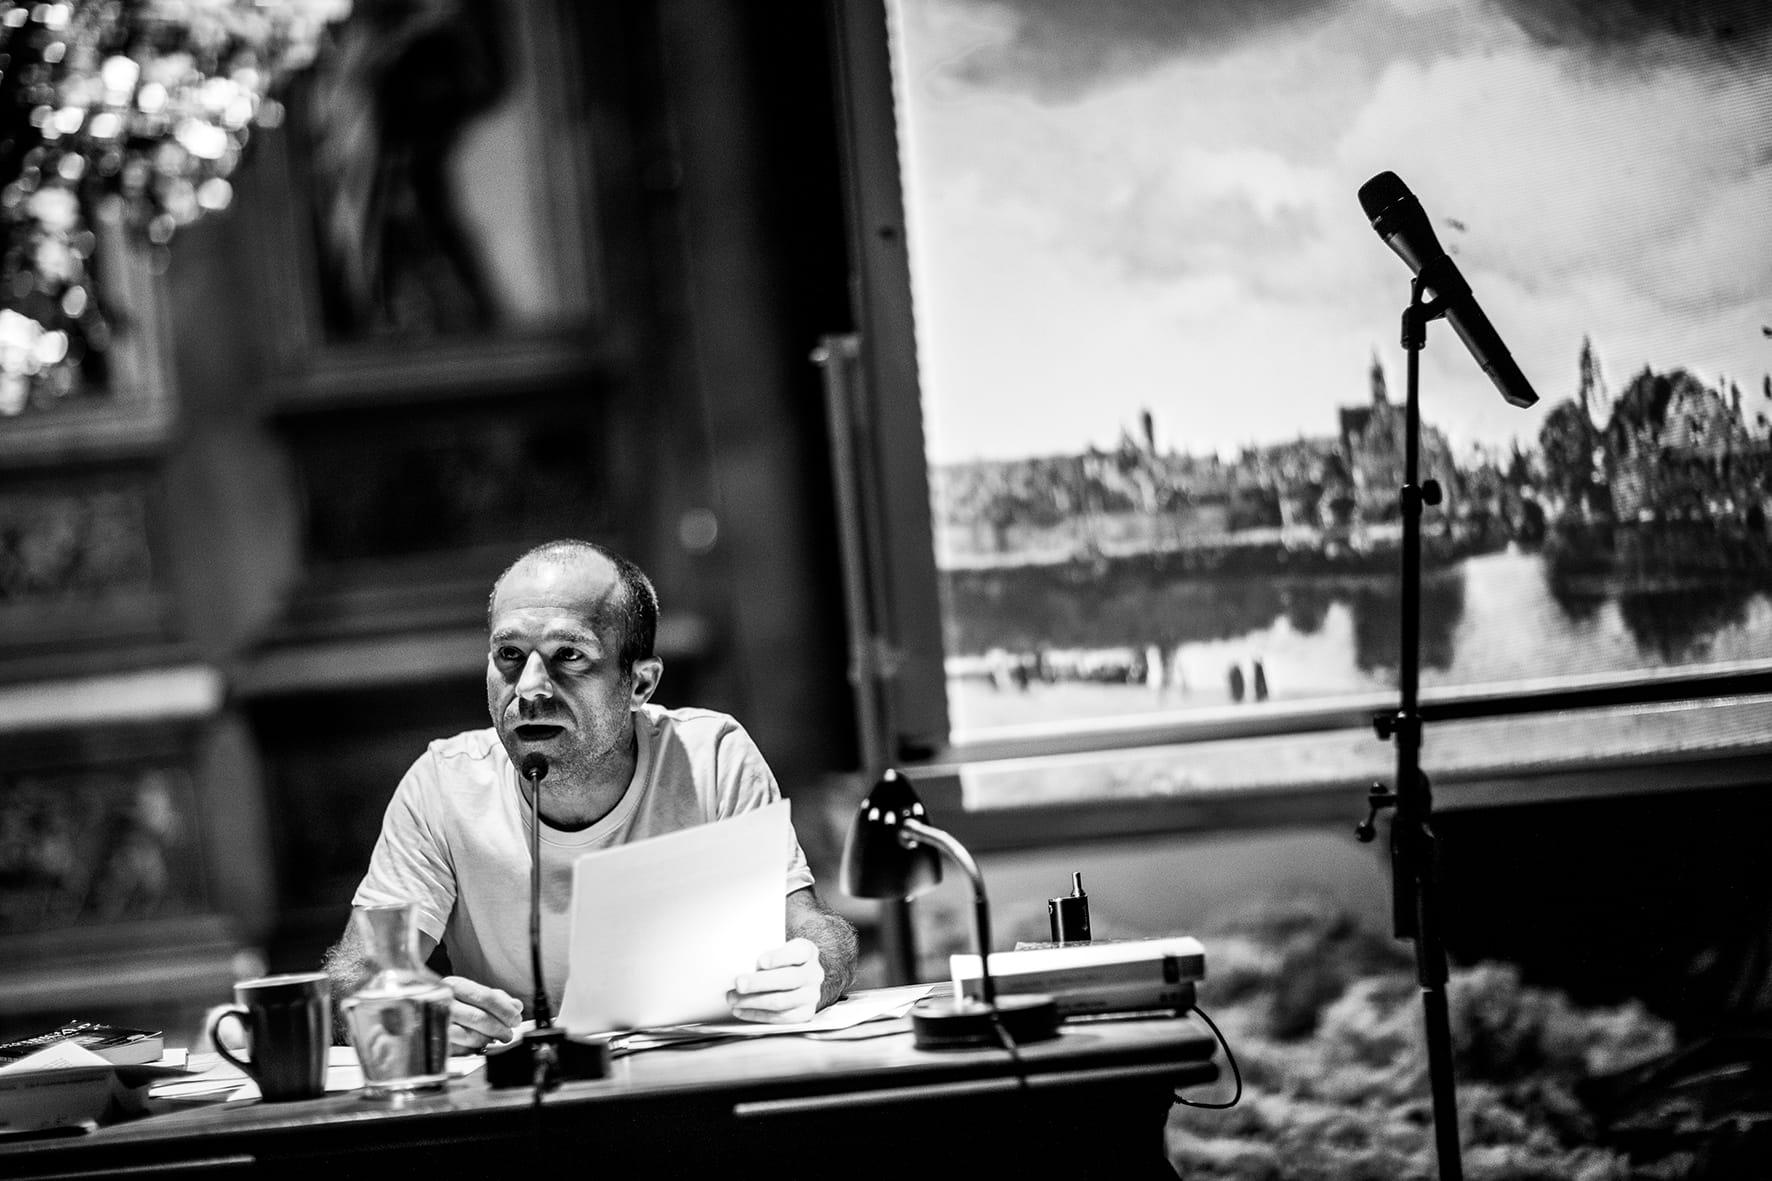 HOW DEEP IS YOUR USAGE DE L'ART ? (NATURE MORTE par Benoît Lambert, Jean-Charles Massera